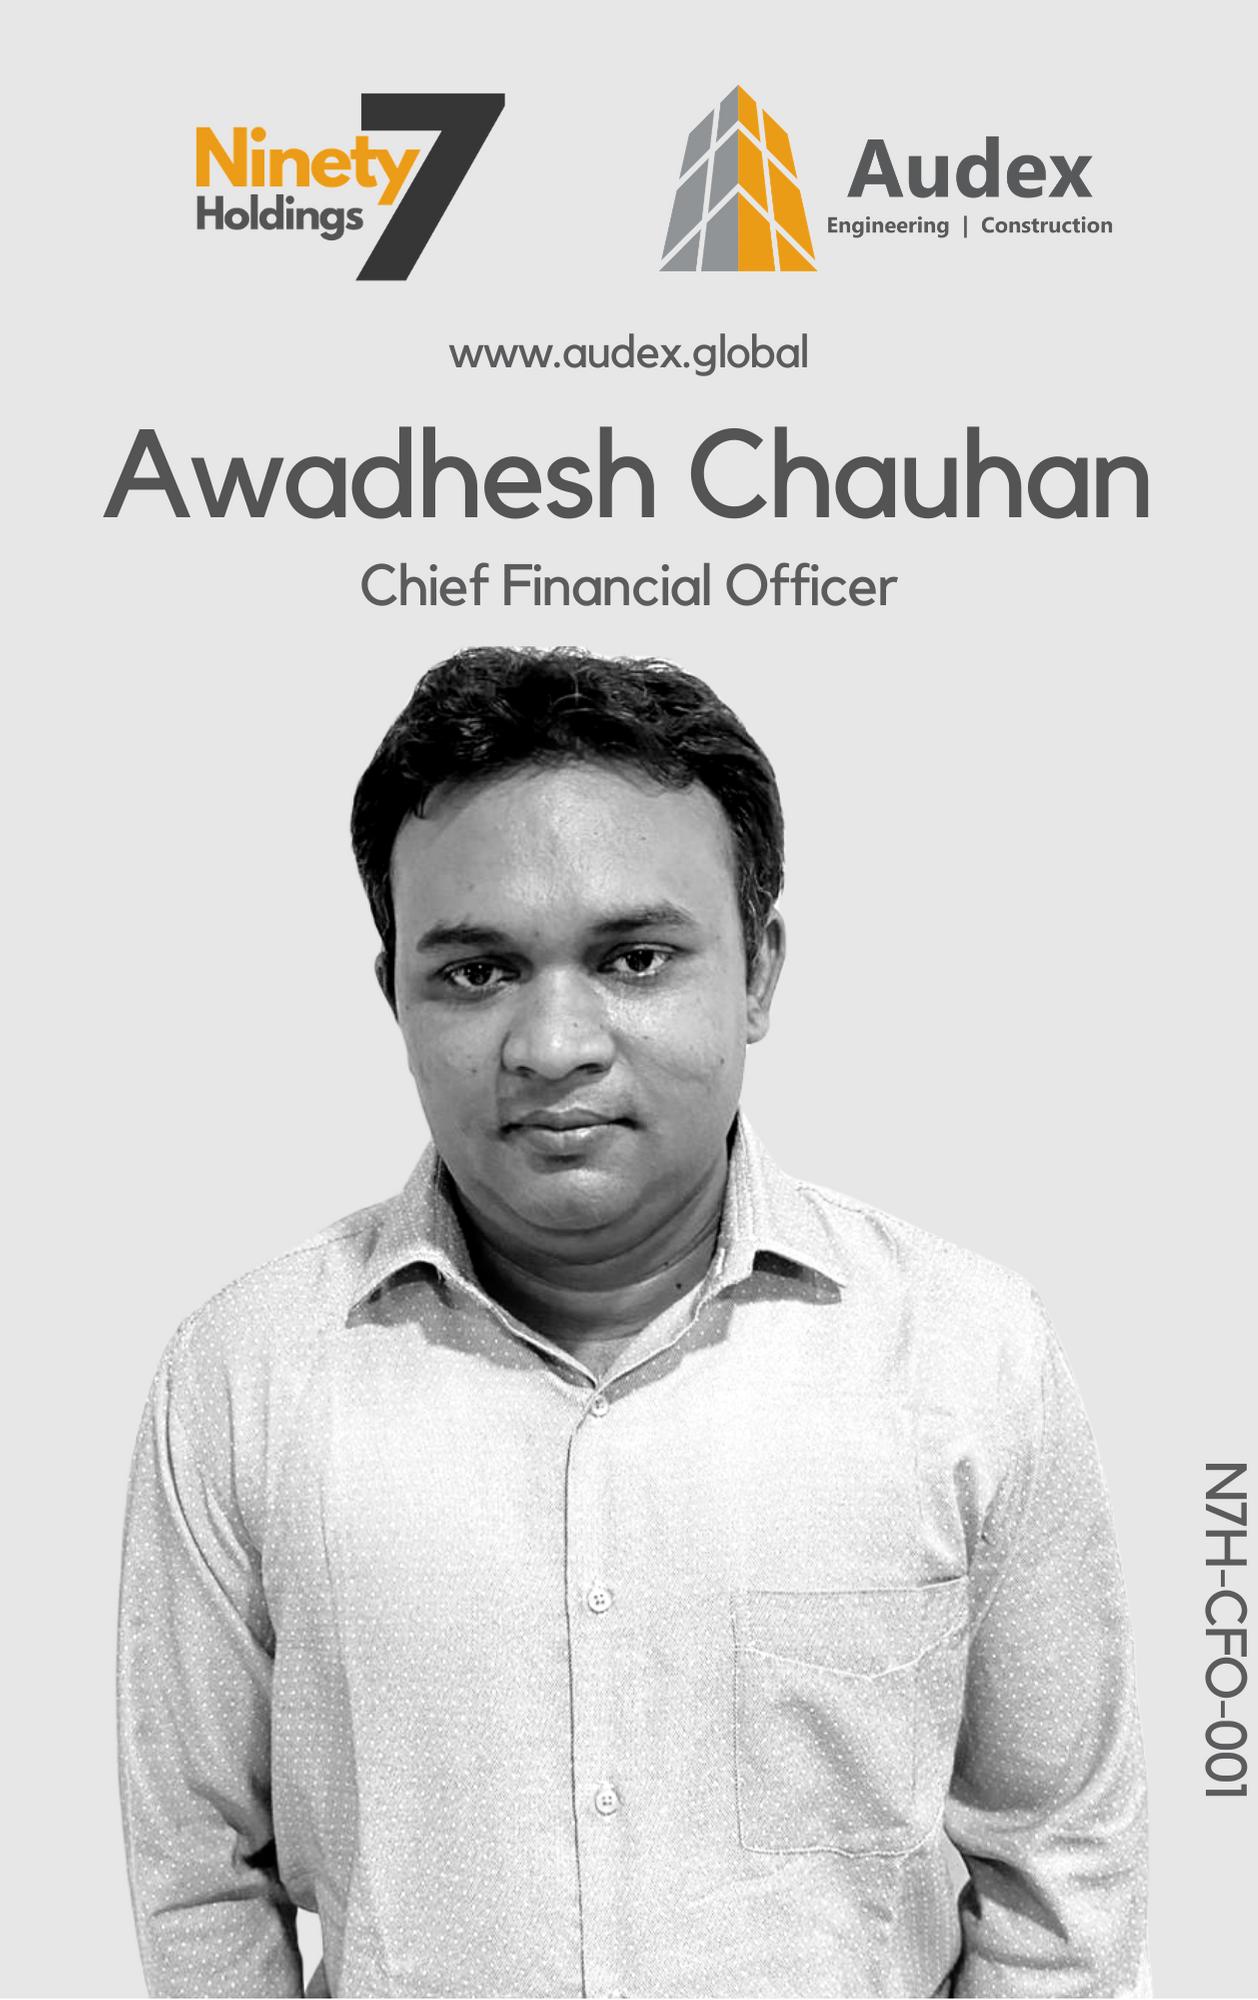 Awadhesh Chauhan